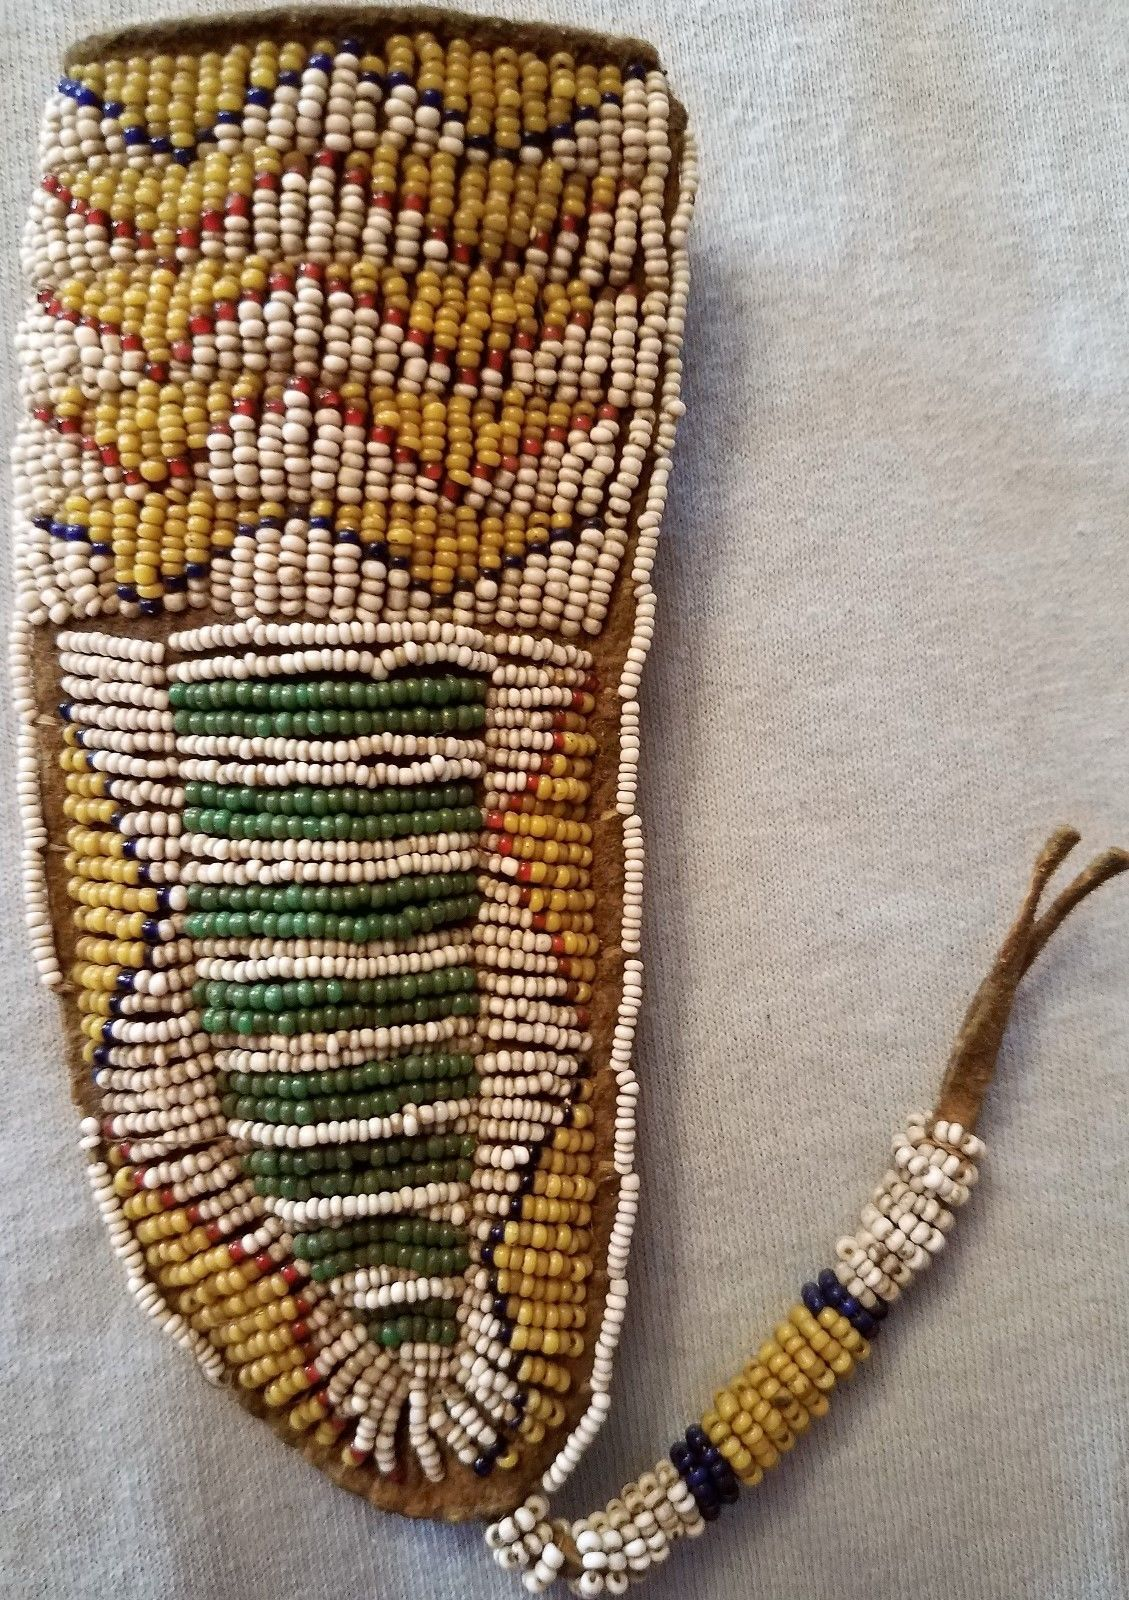 Cheyenne Or Iroquois Beaded Knife Sheath Amp Knife